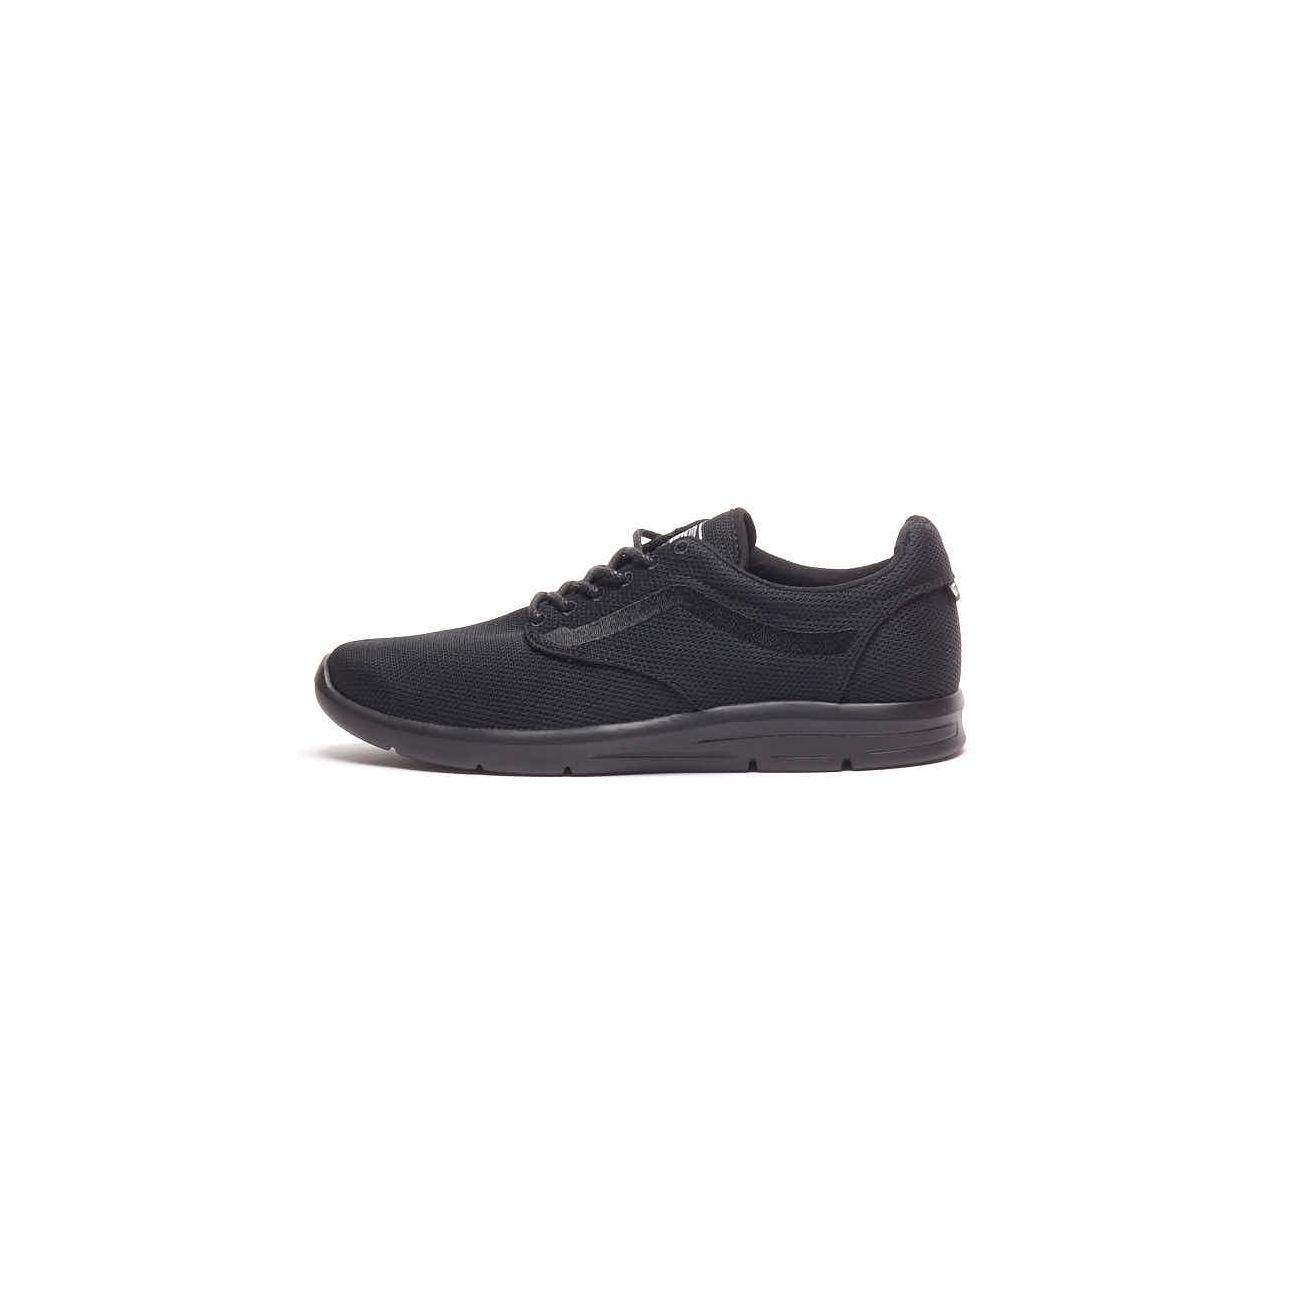 VANS VANS SNEAKER ISO 1.5 Uomo Mono Black   Mascheroni Sportswear